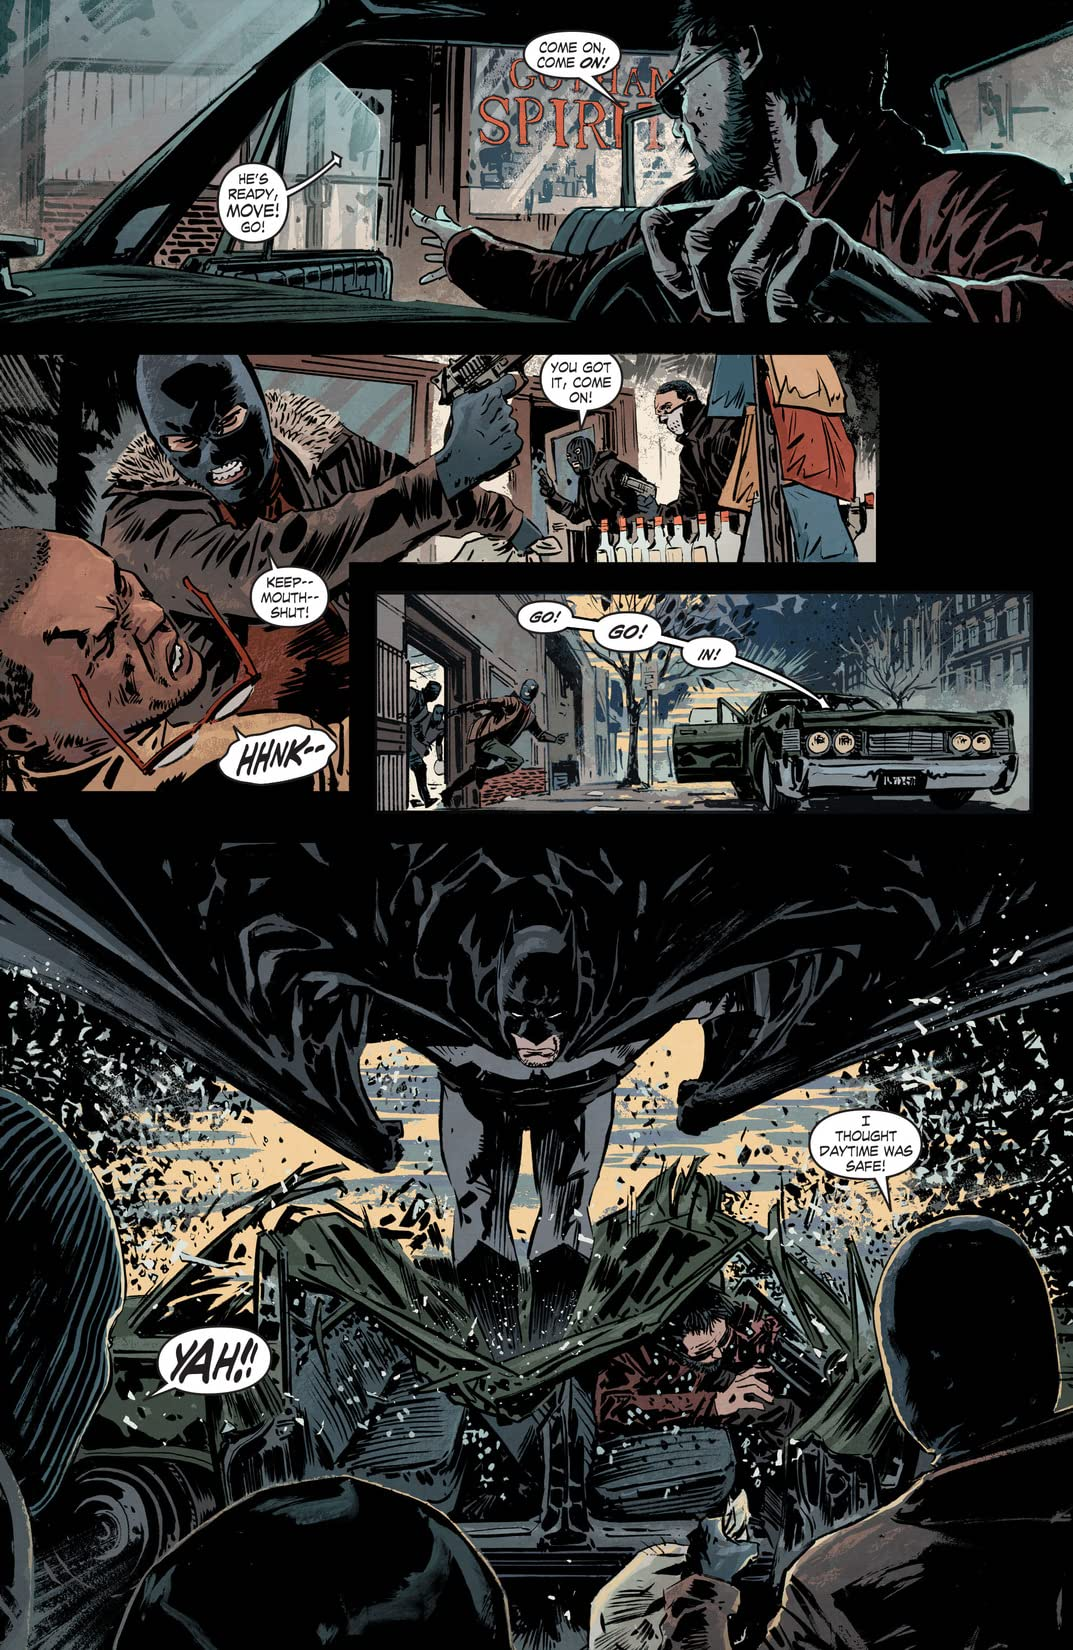 Legends of the Dark Knight (2012-2015) Vol. 2